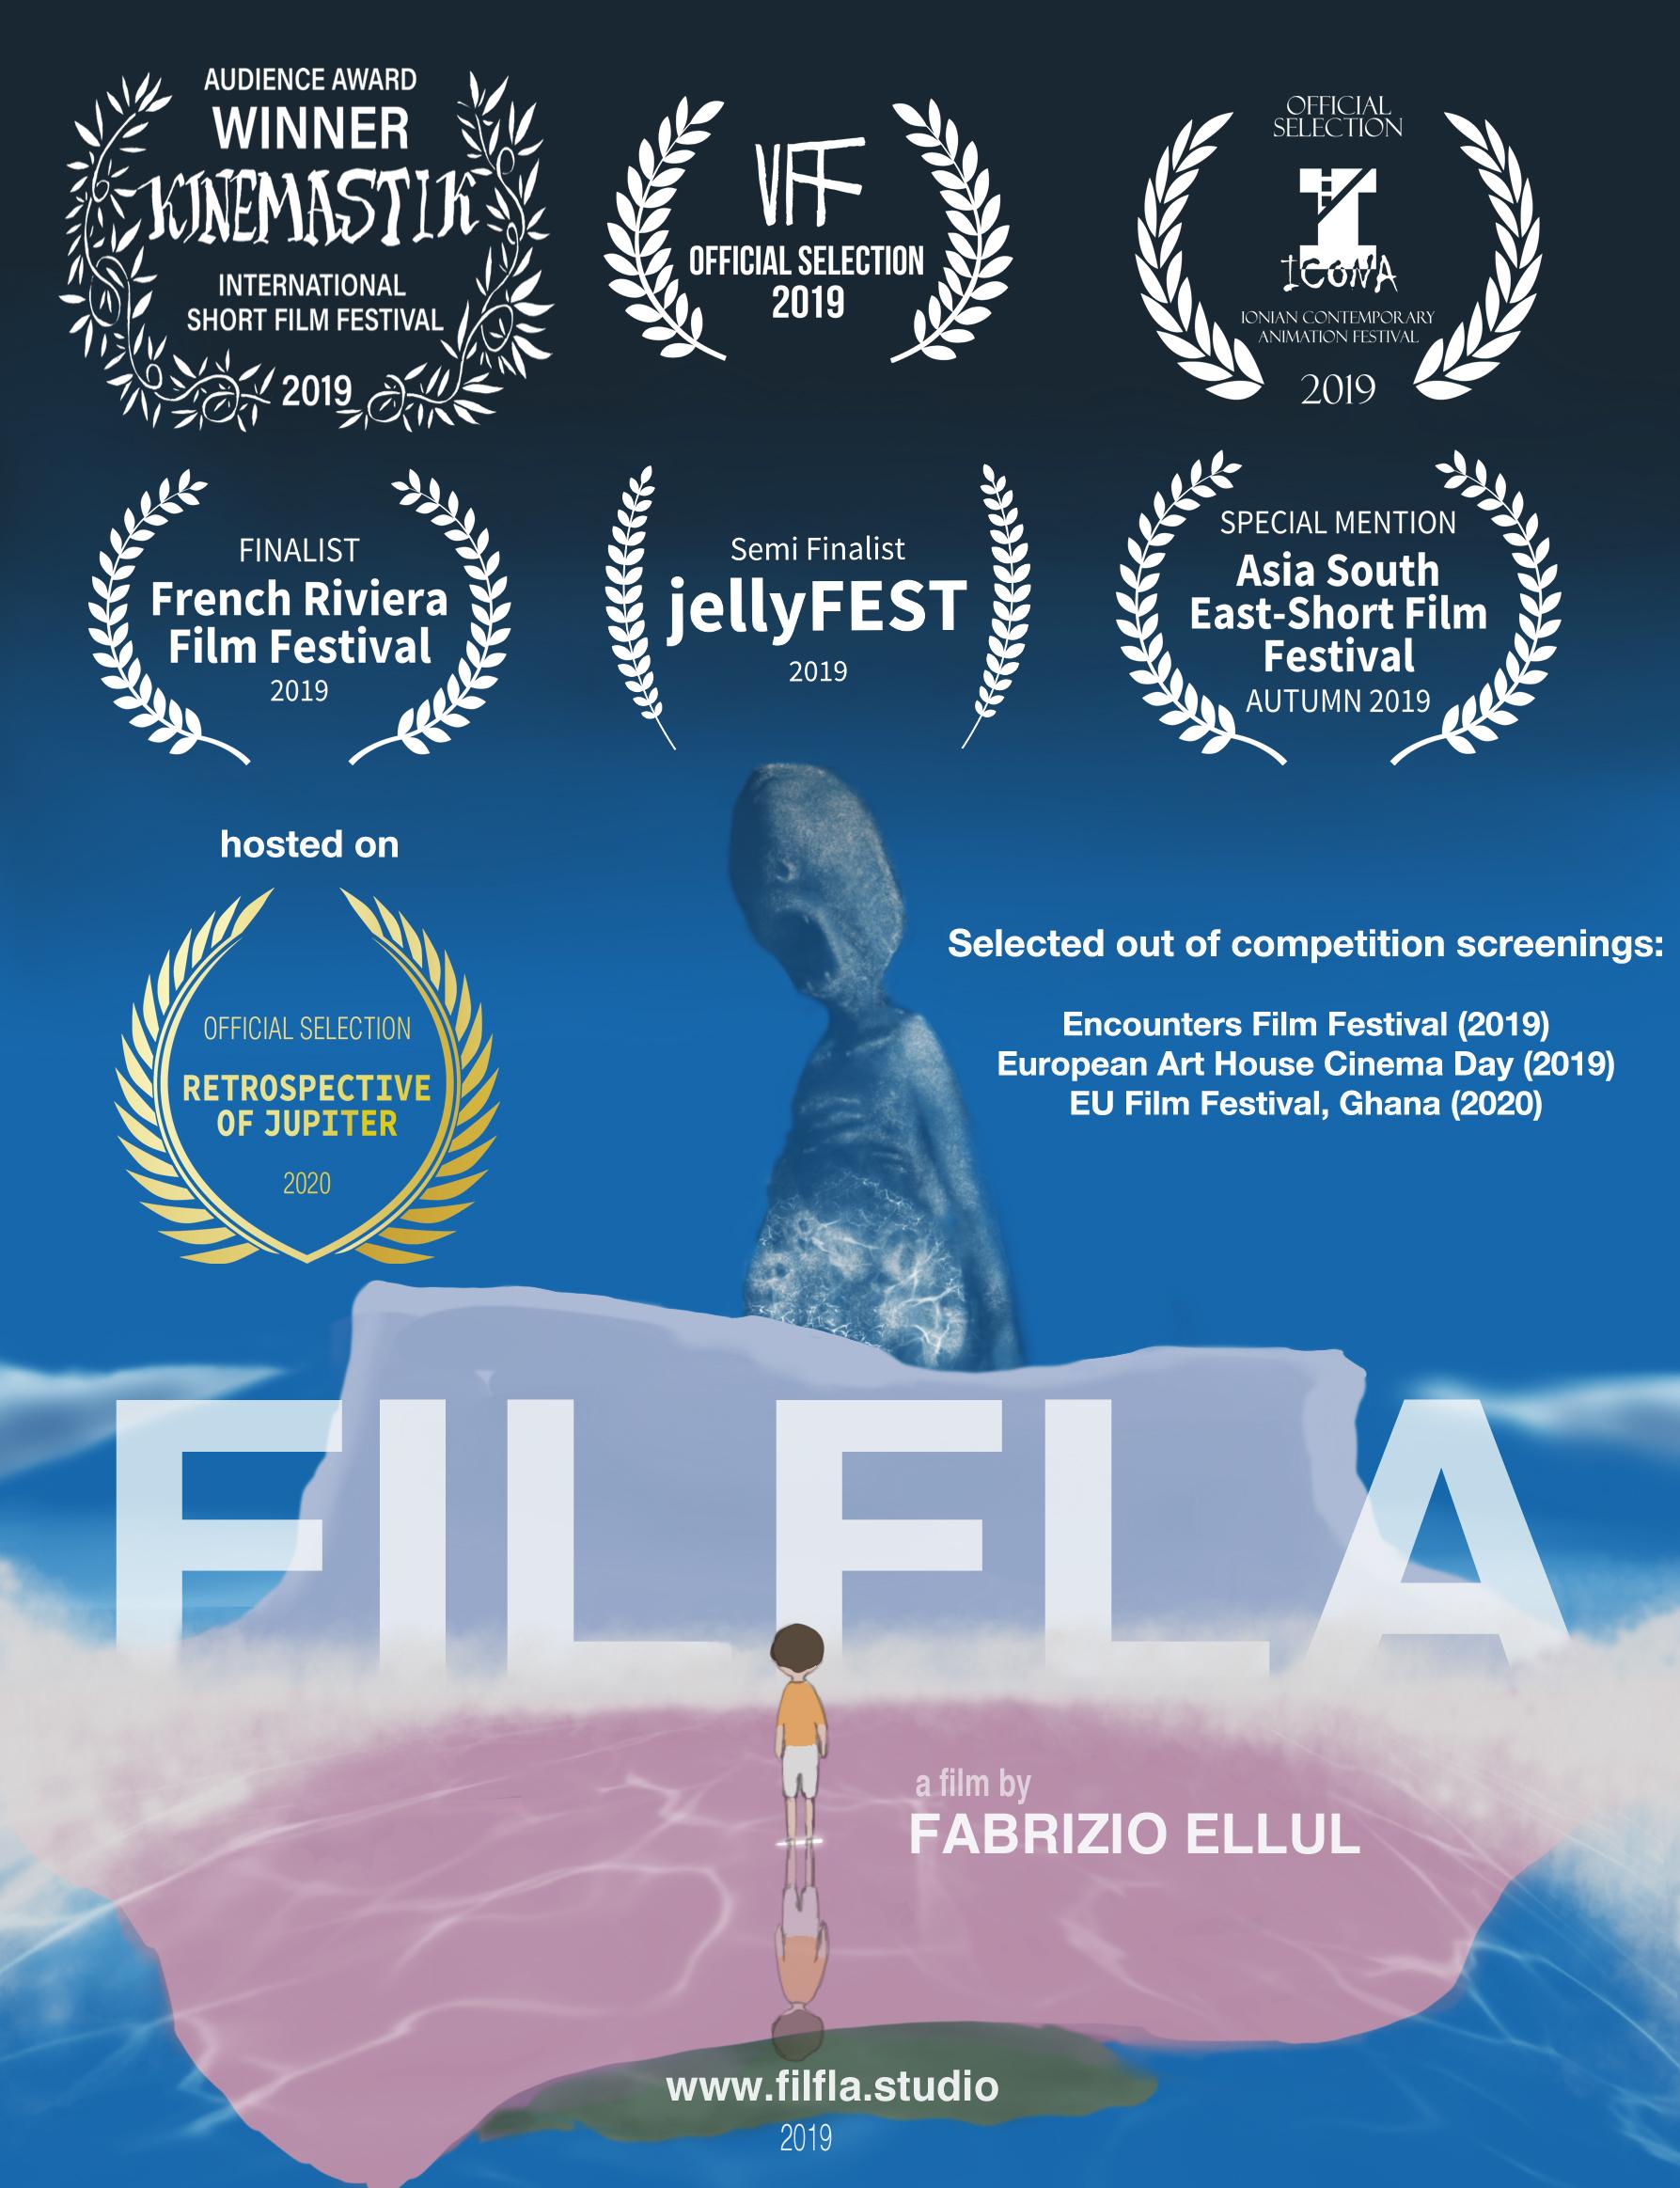 poster filfla studio 2020